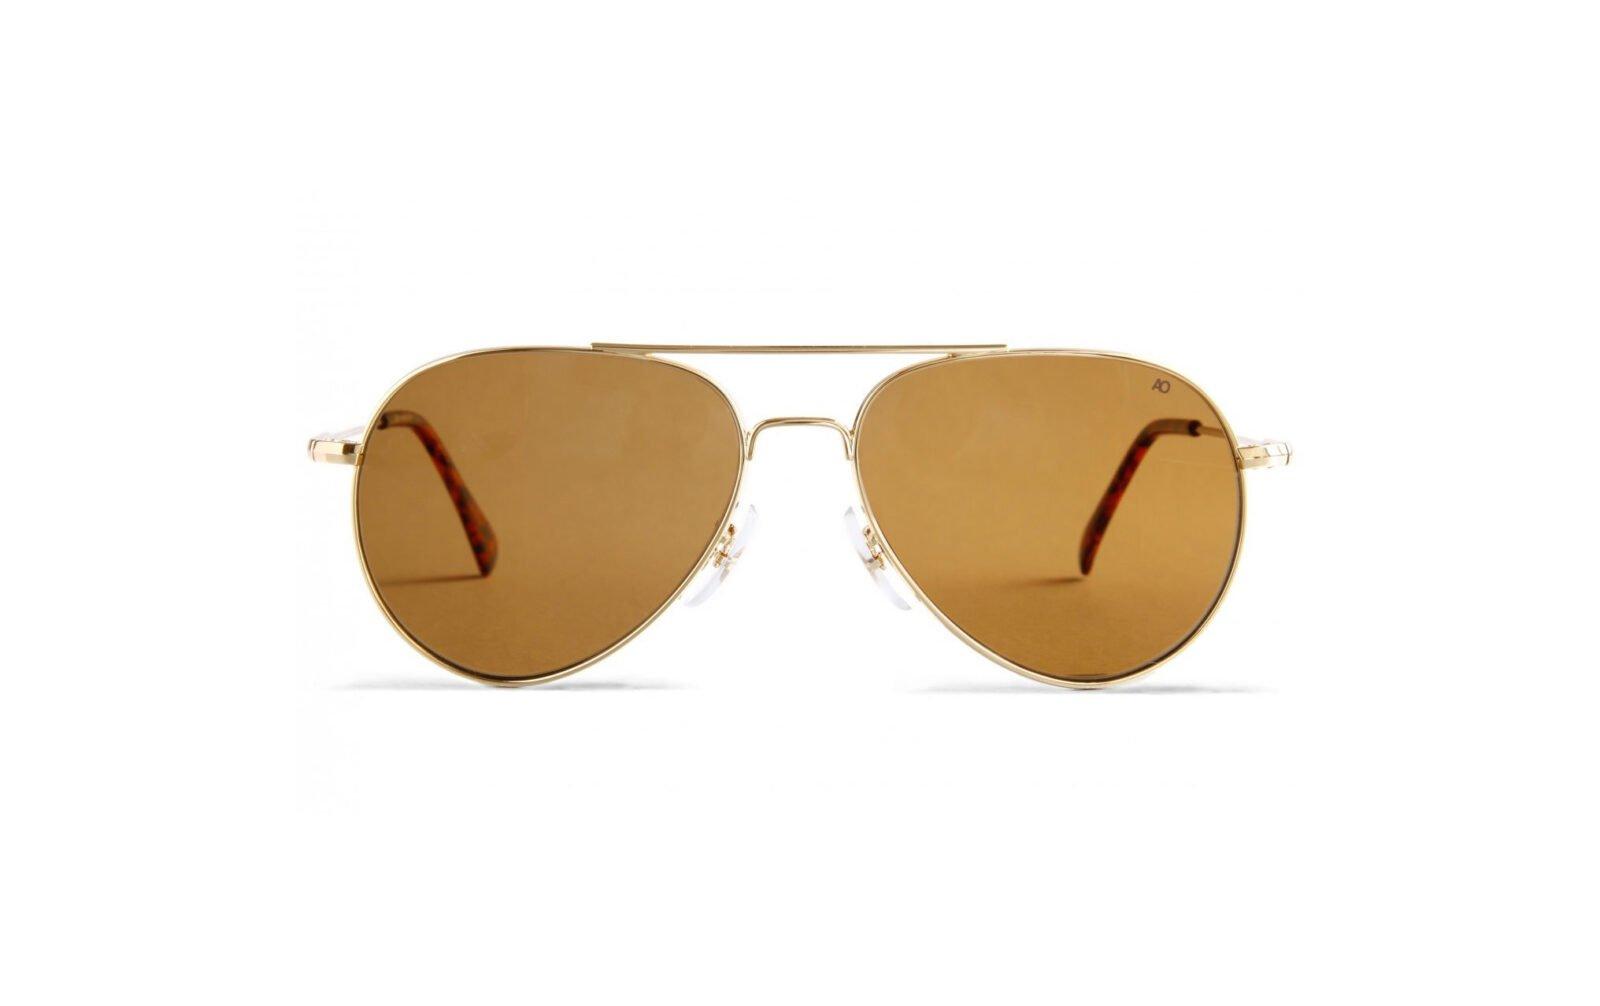 American Optical General Sunglasses 1600x1006 - American Optical General Sunglasses